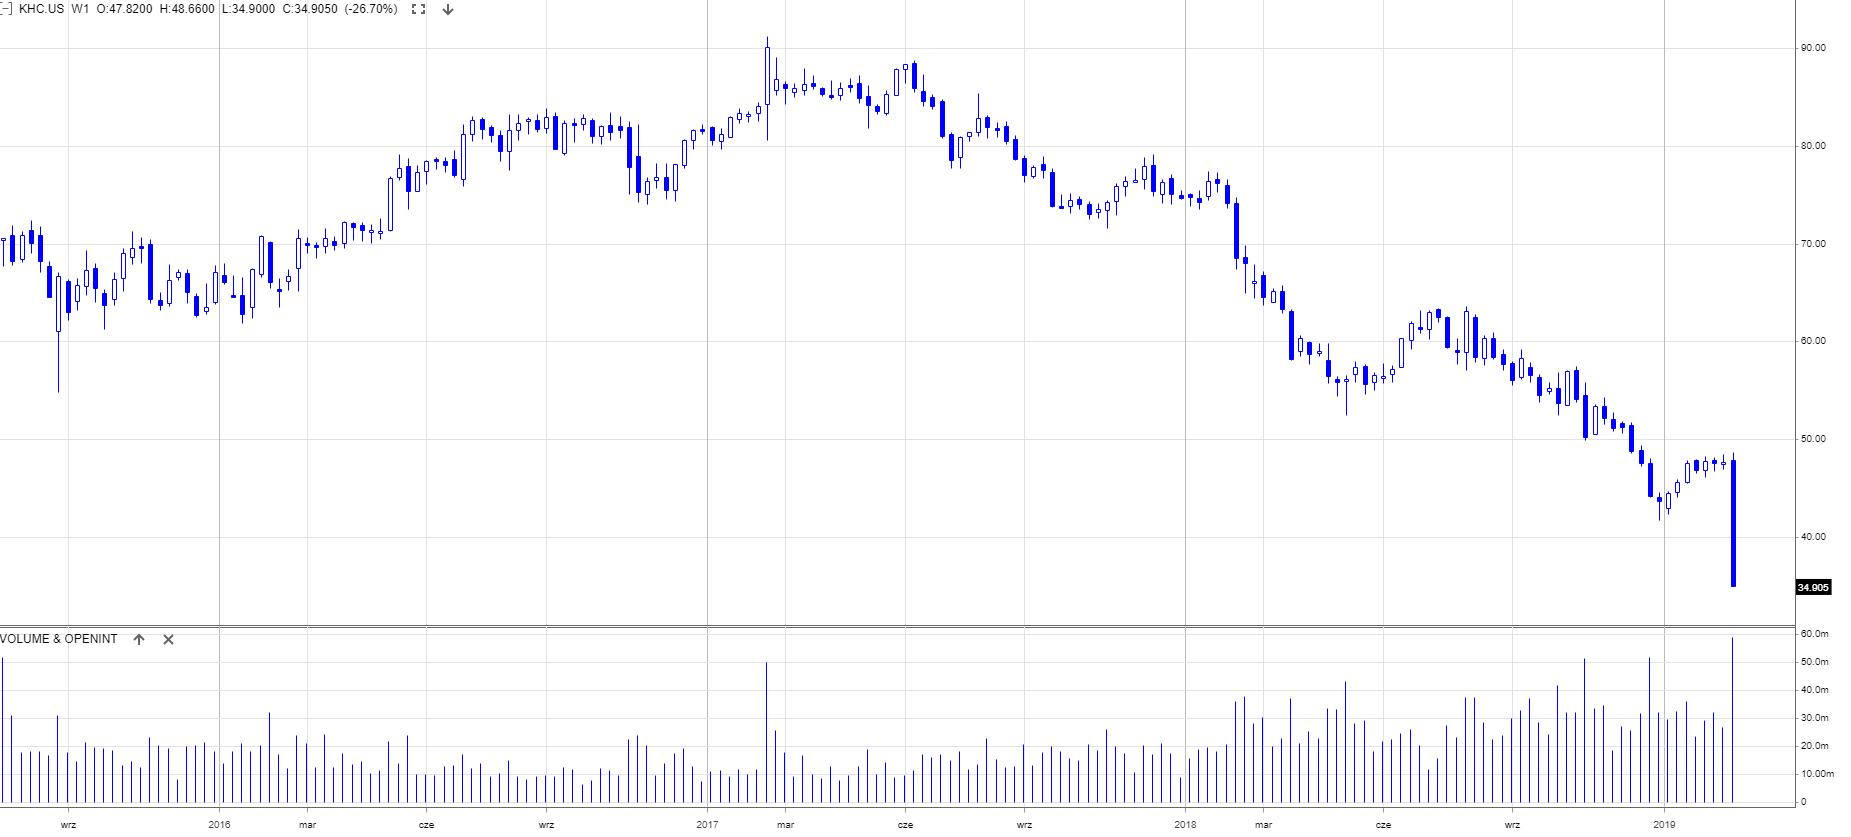 Spółka Buffeta straciła $2,8 mld na silnych spadkach akcji Kraft Heinz